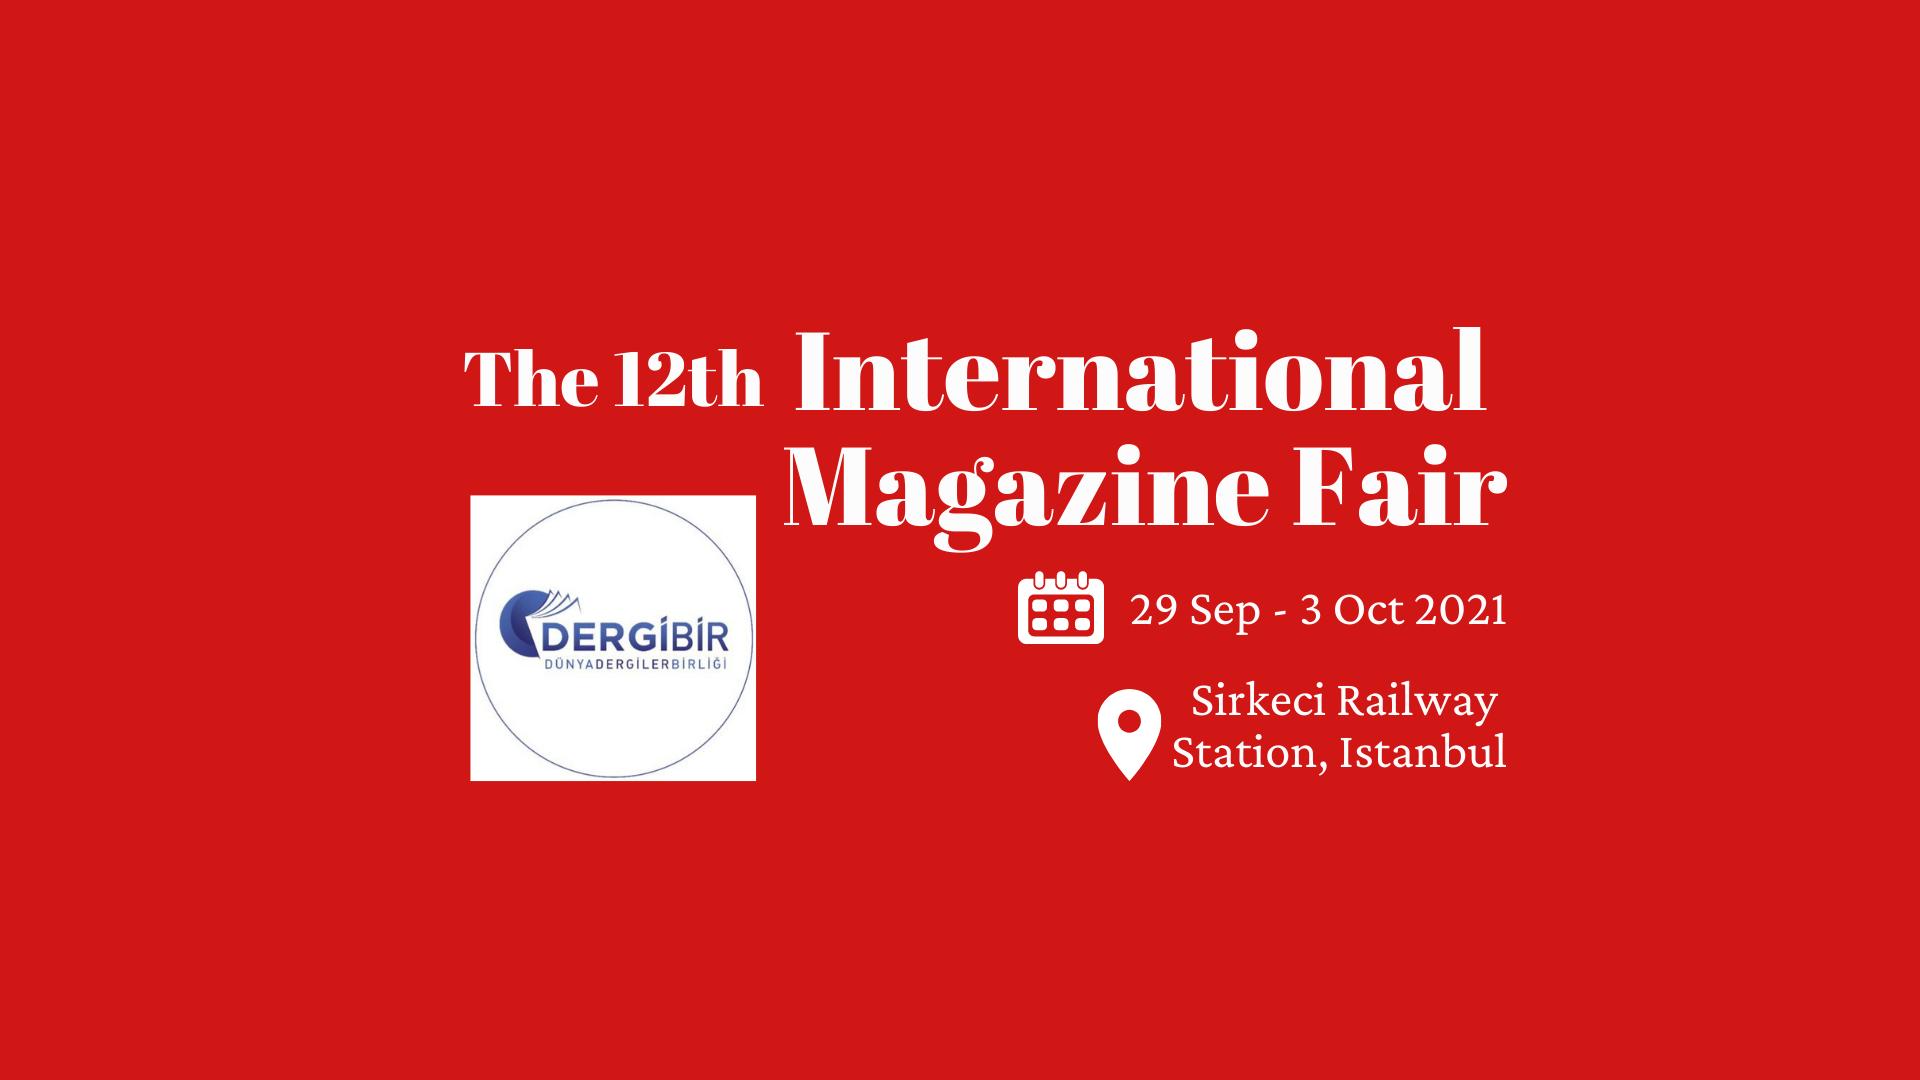 International Magazine Fair